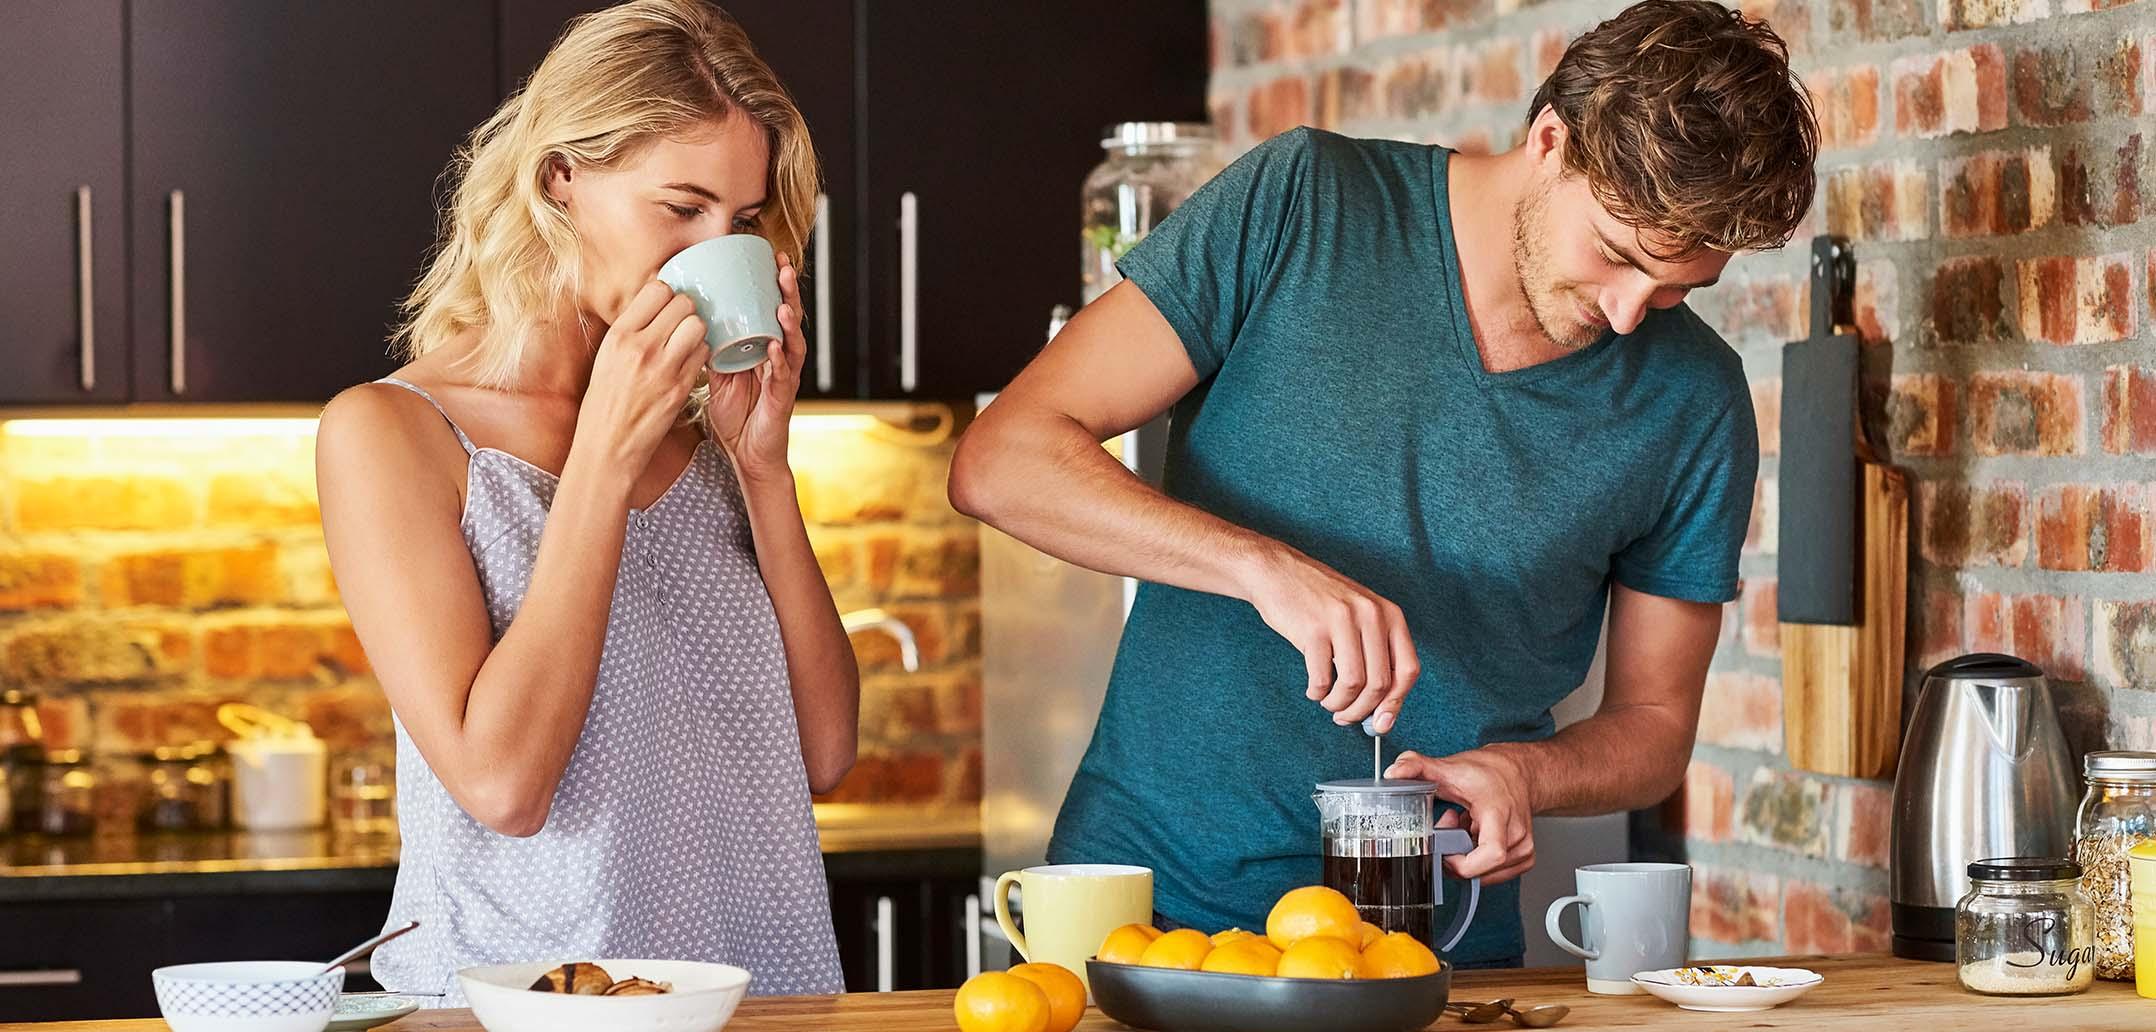 Paar macht gemeinsam Kaffee